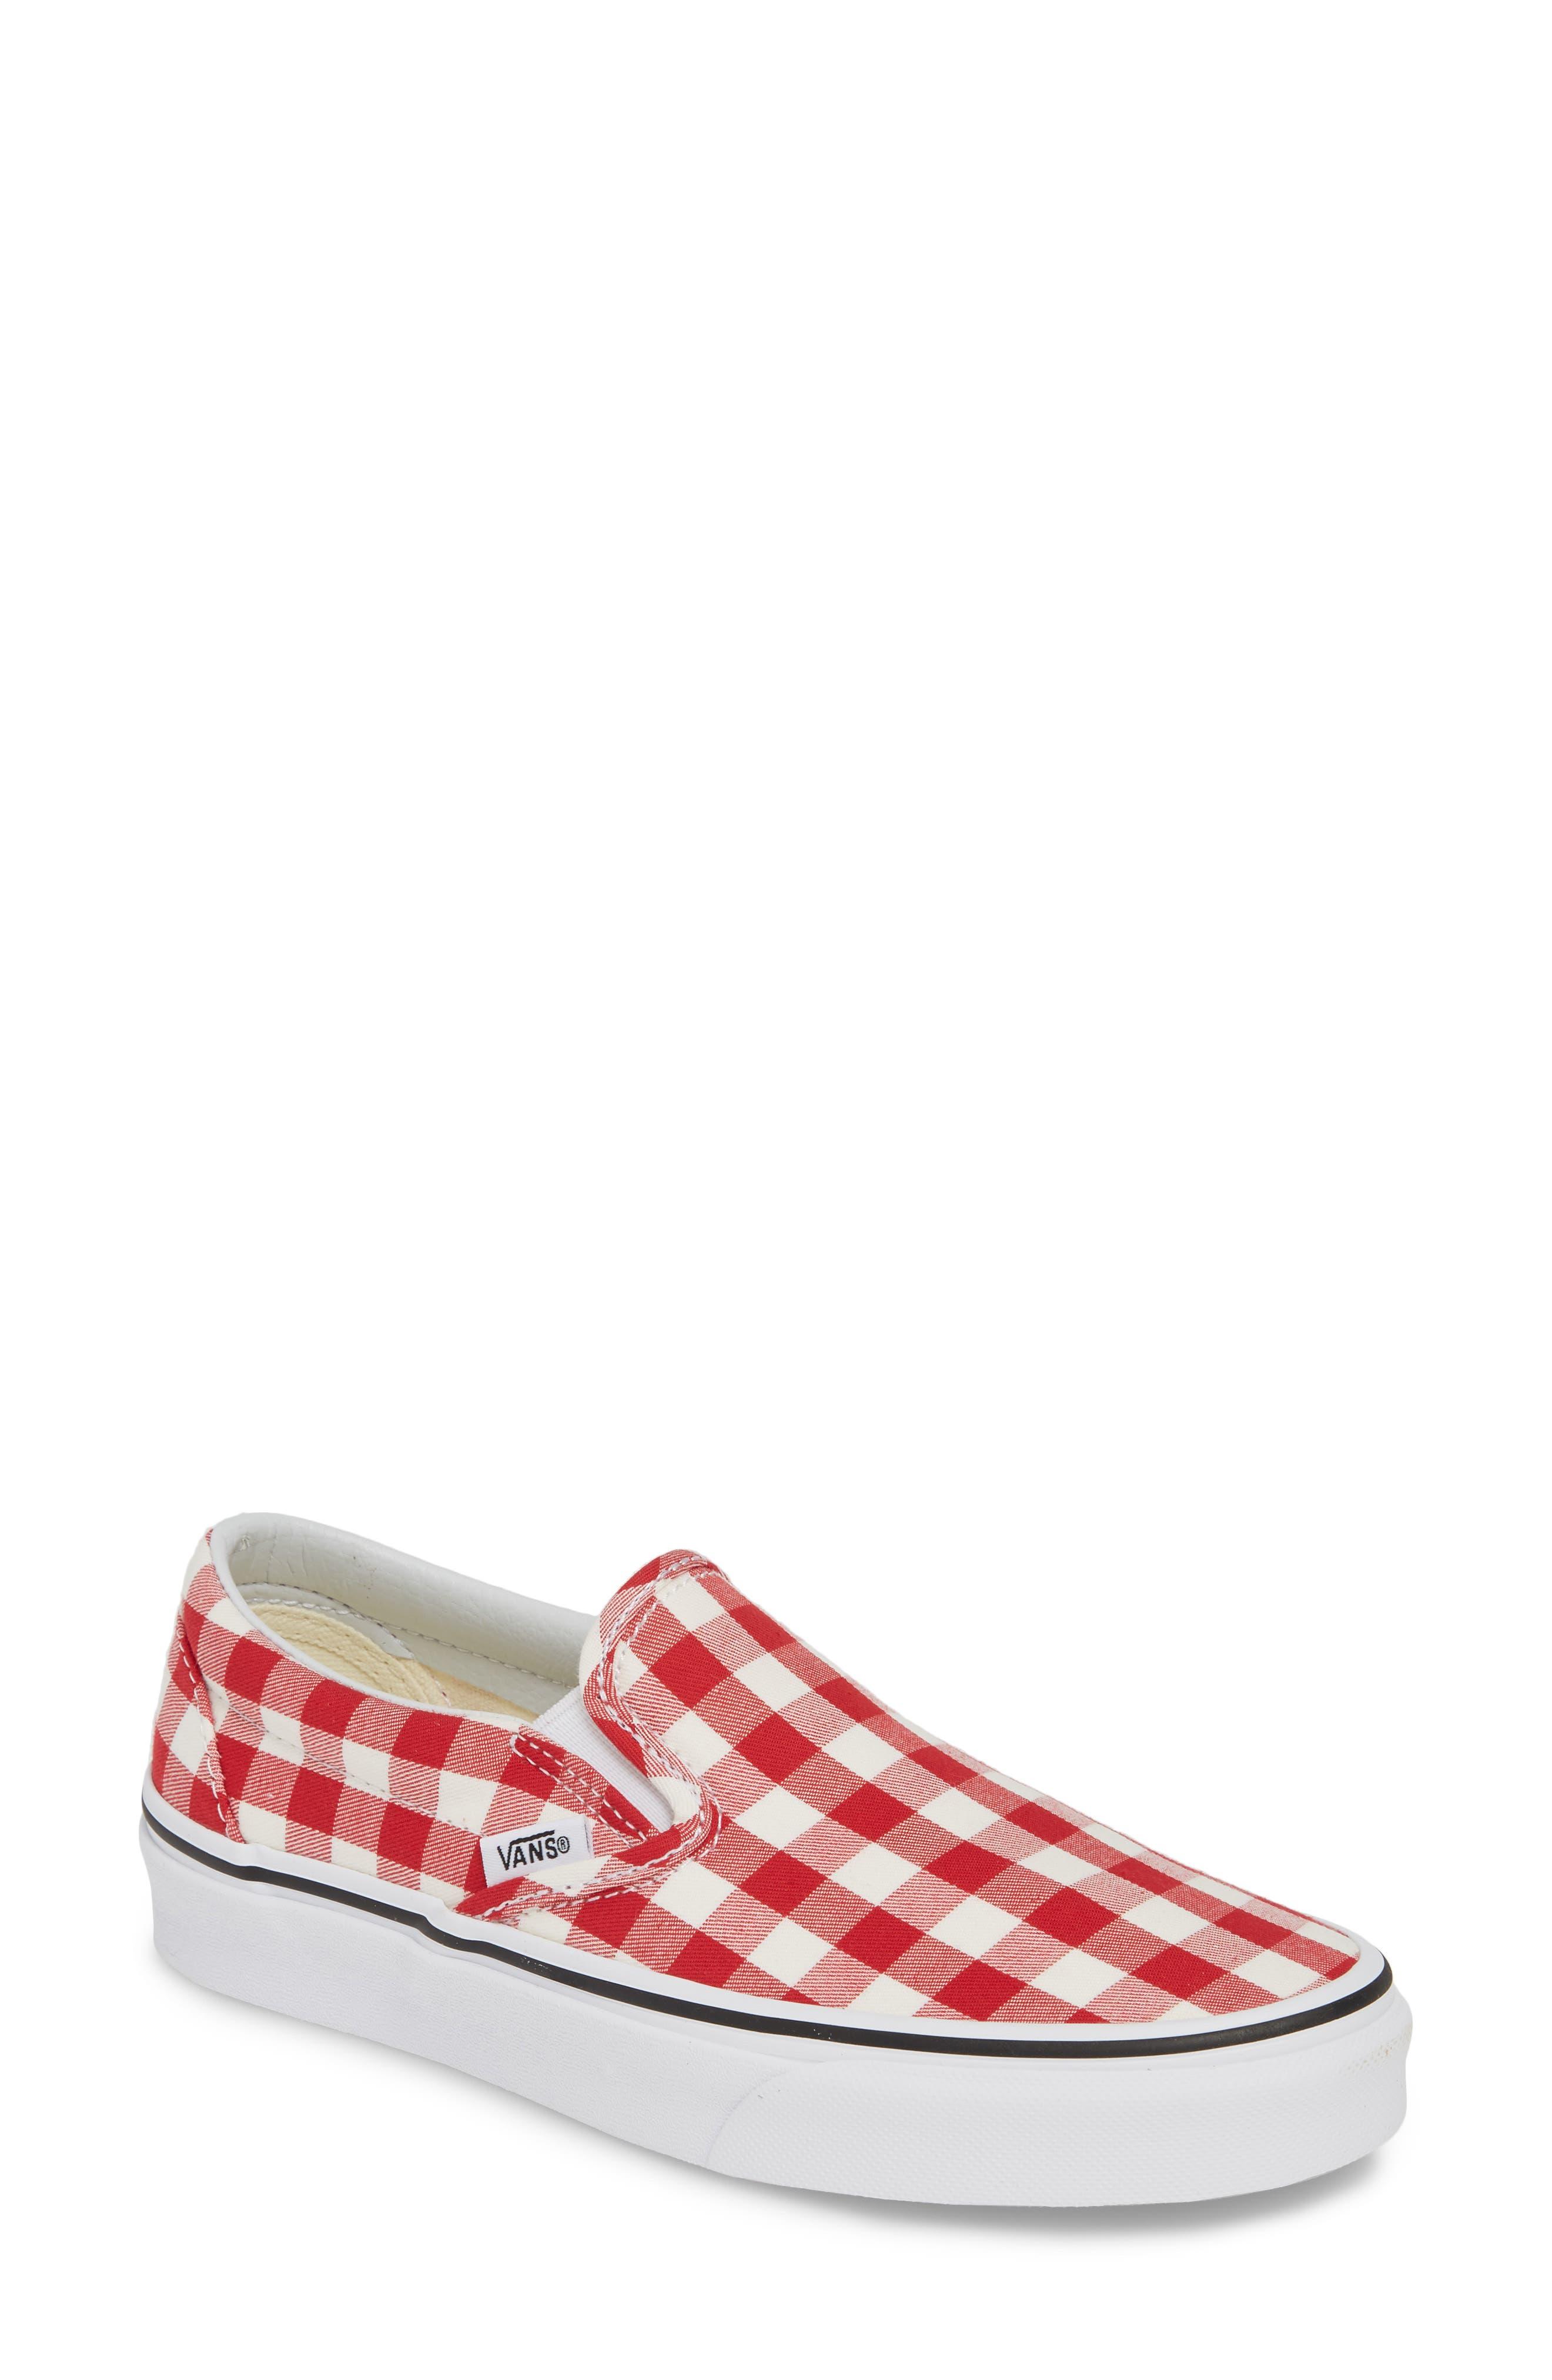 ,                             Classic Slip-On Sneaker,                             Main thumbnail 473, color,                             611